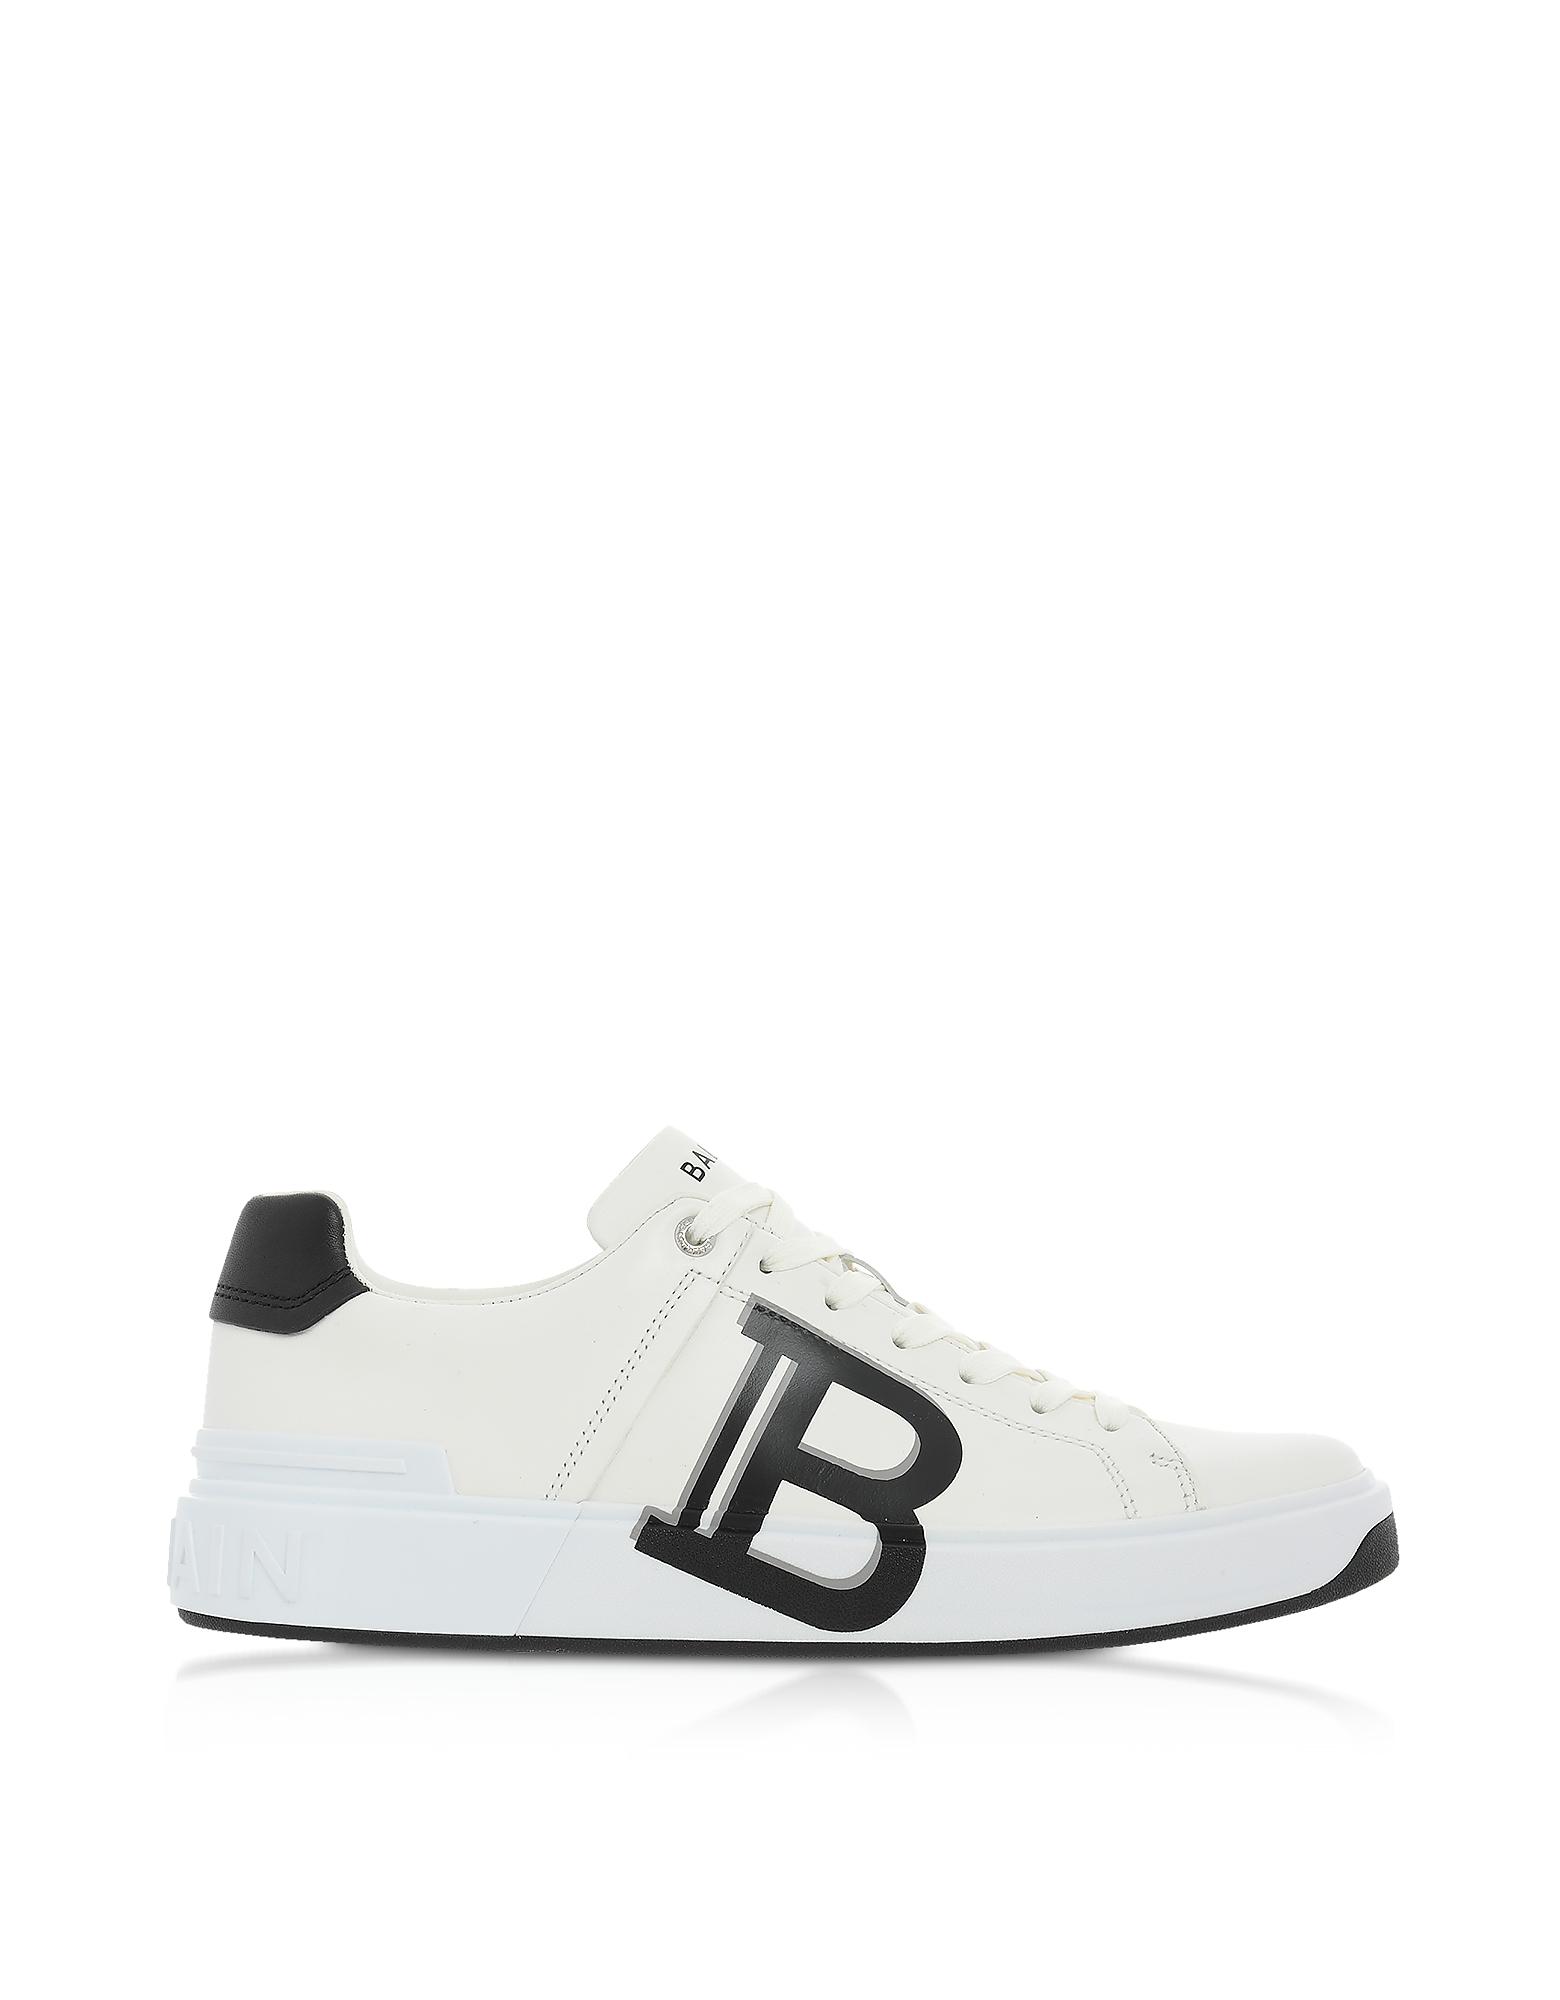 Balmain Designer Shoes, White & Black Low Top Men's B-Court Signature Sneakers